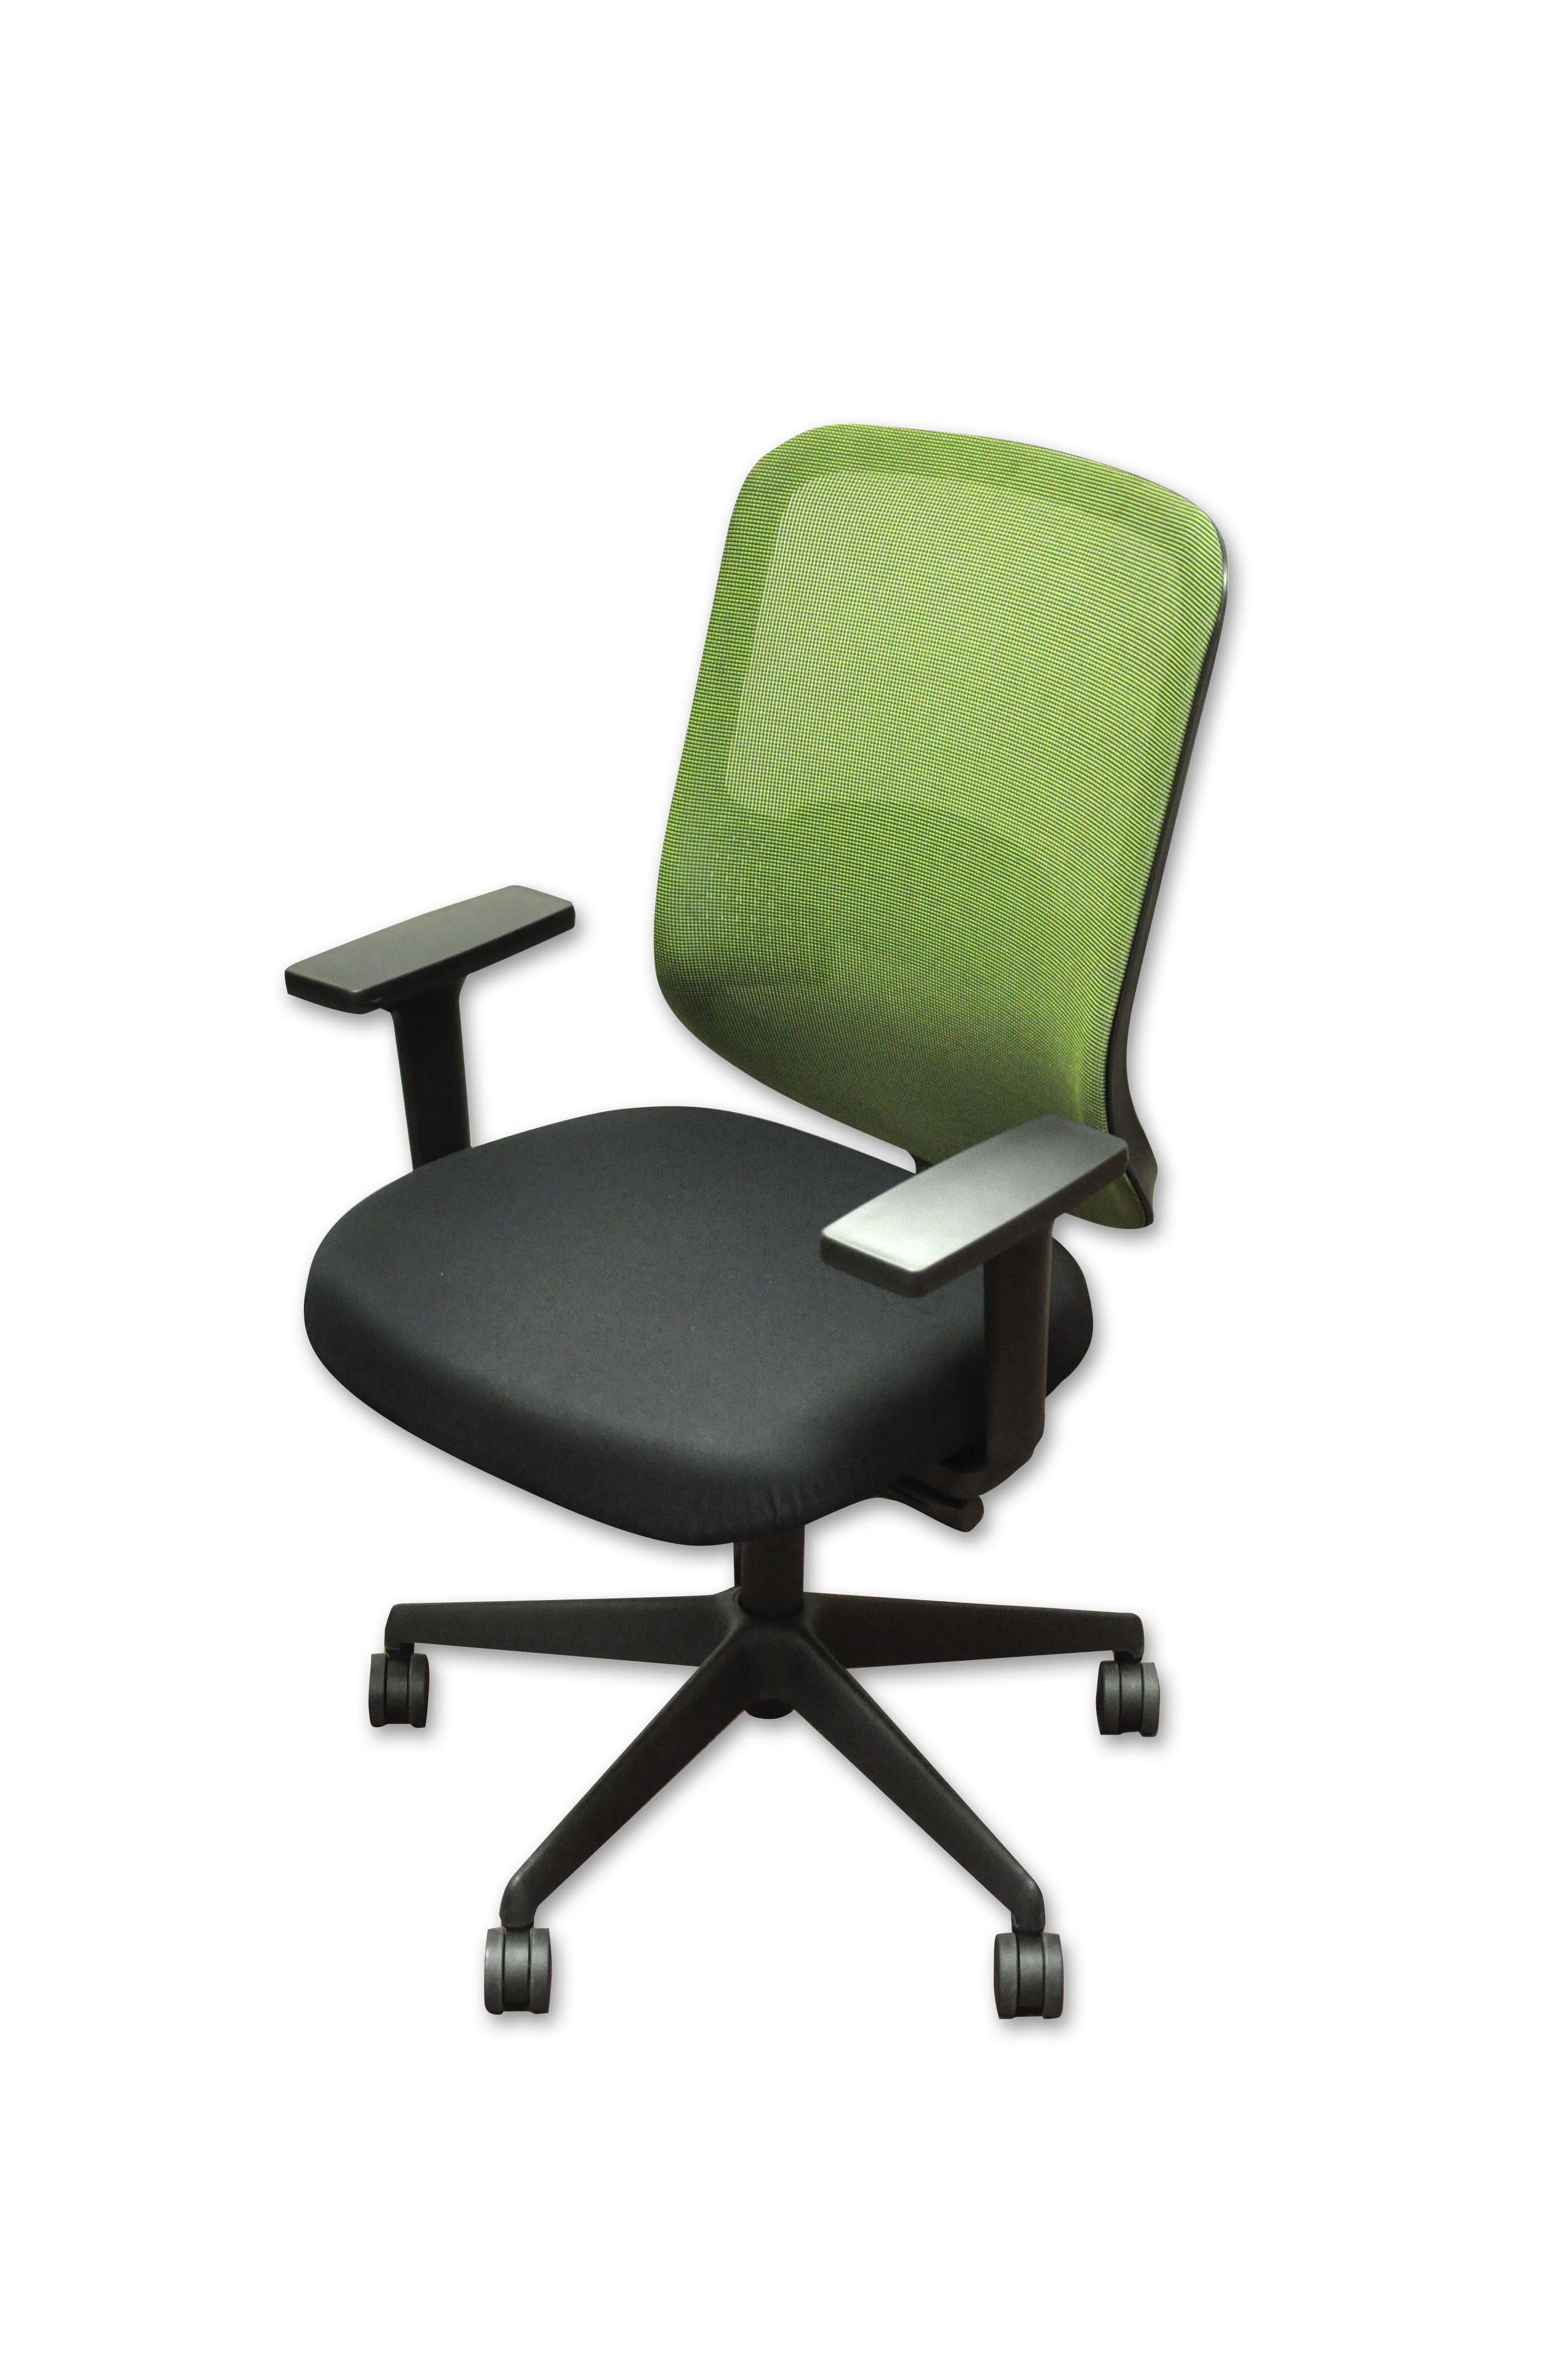 ergonomic chair pros design concept comfort pro 1900 mesh office podany 39s